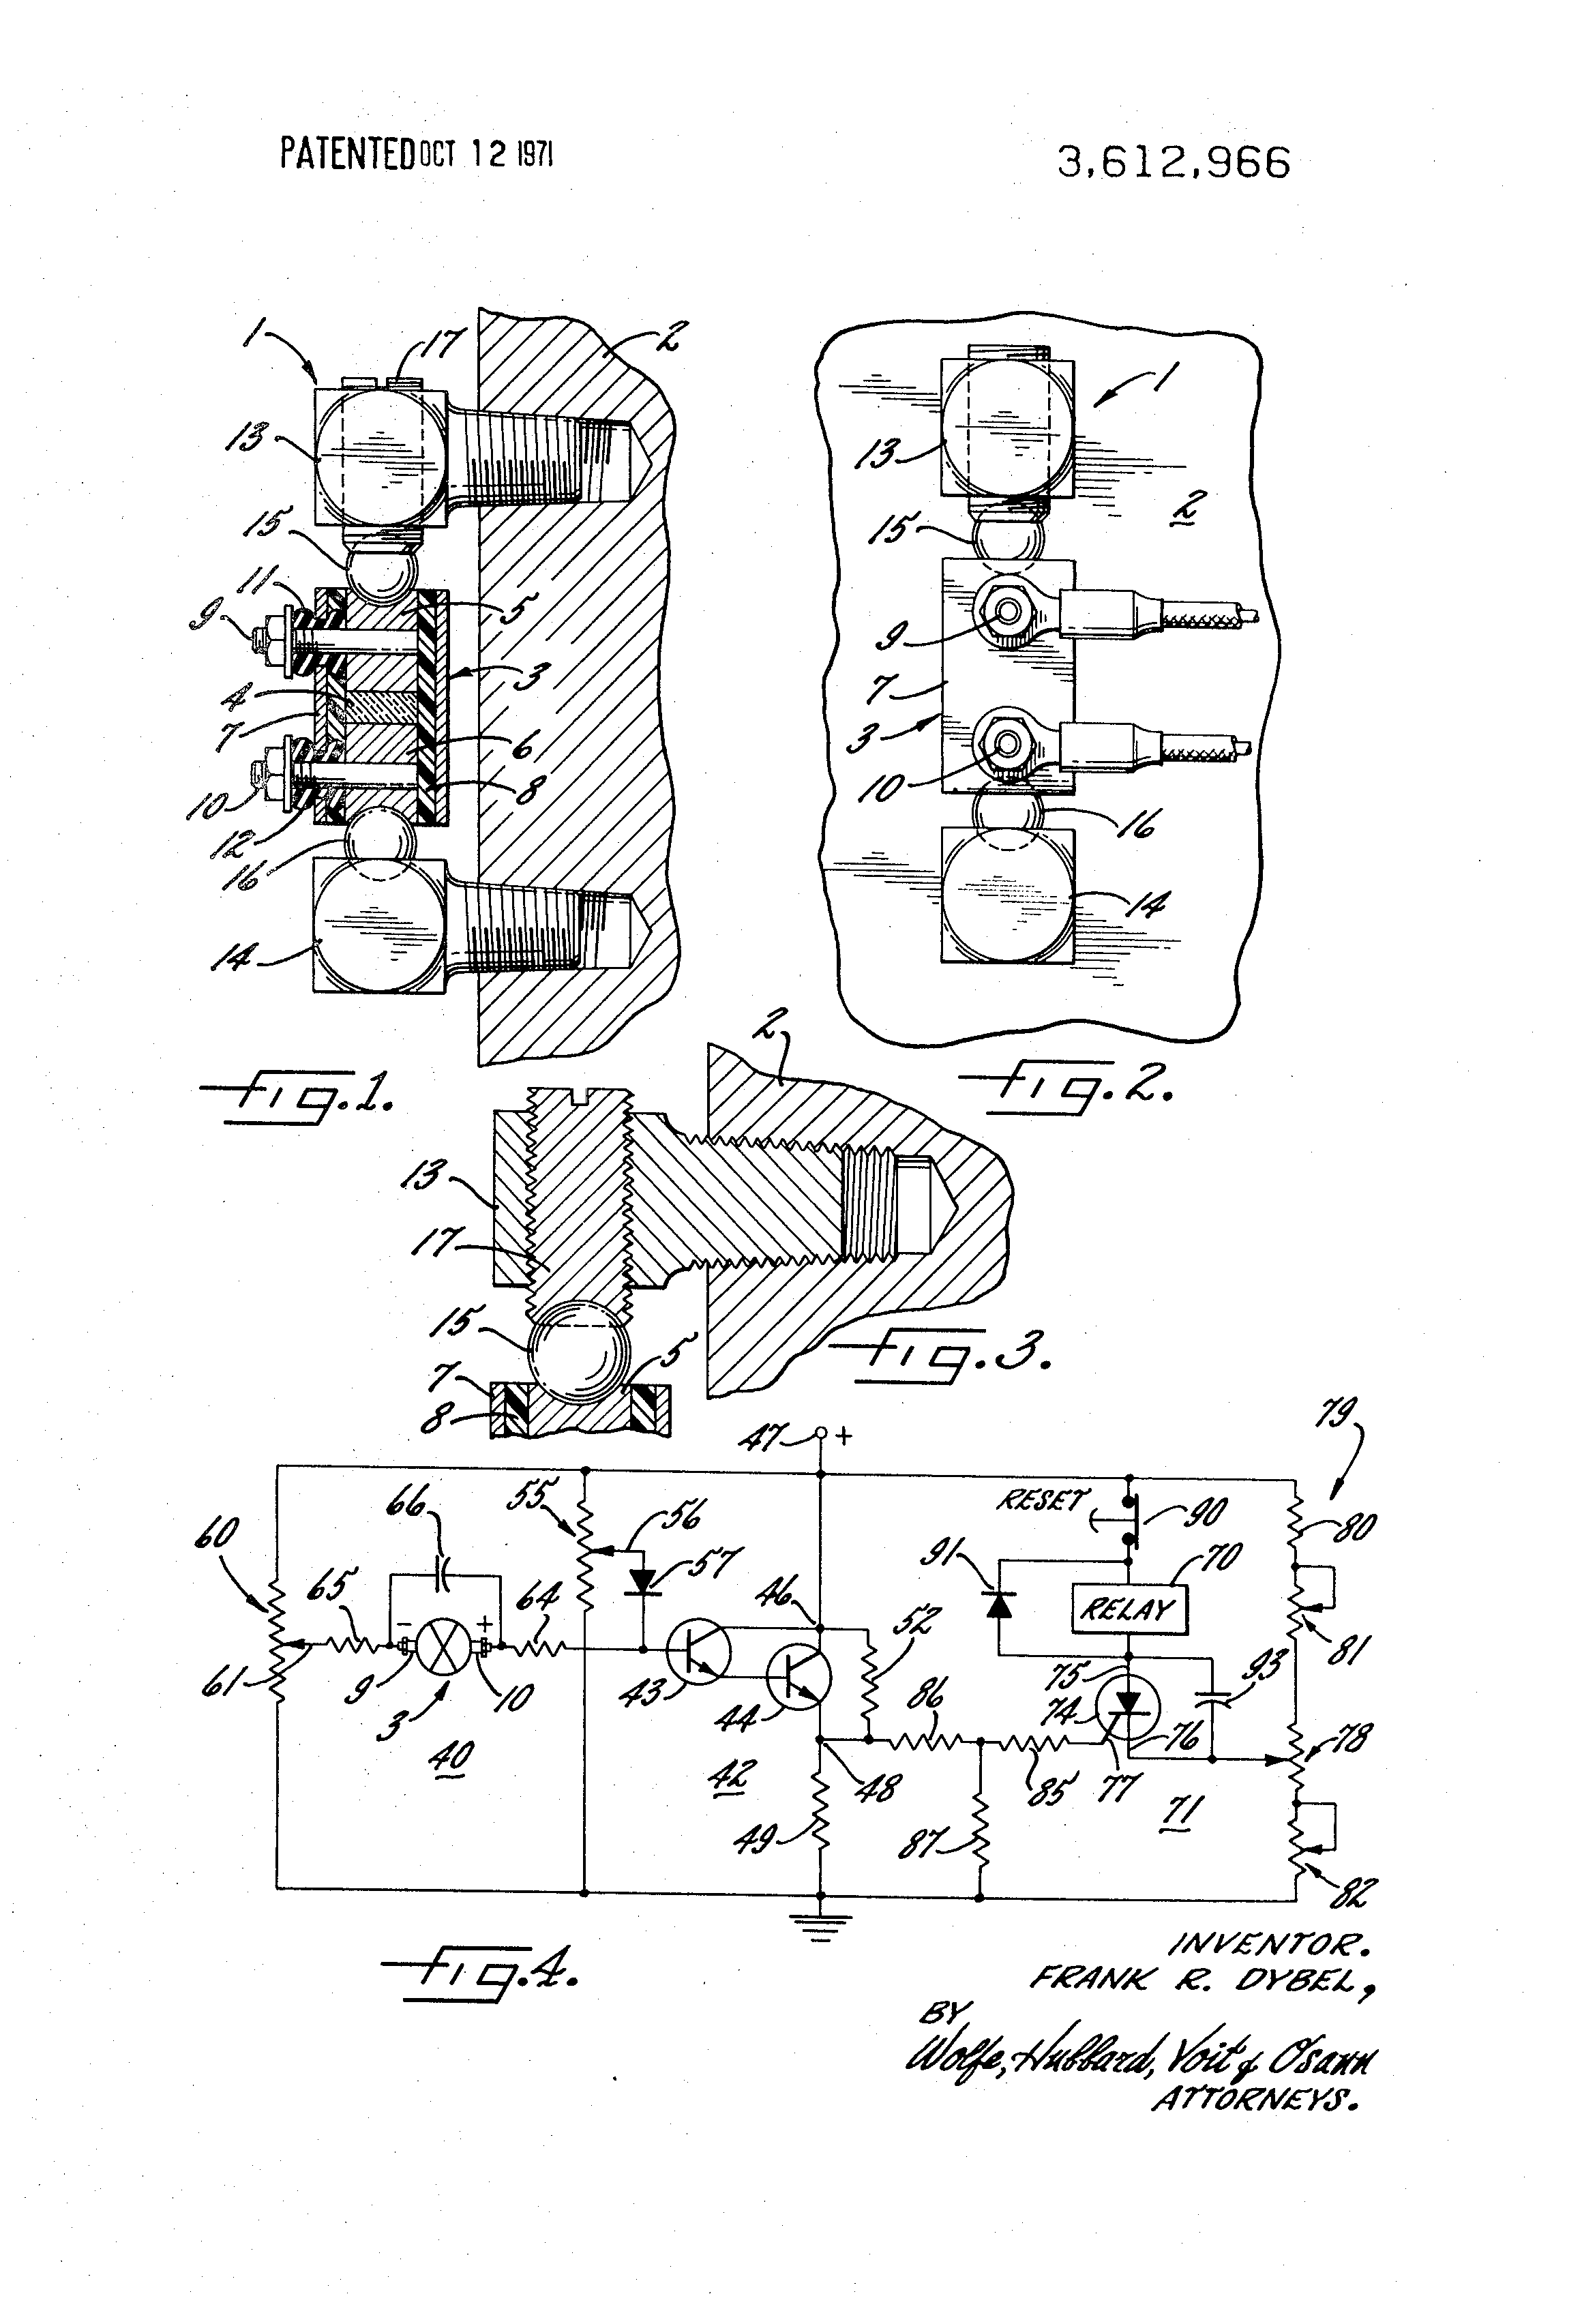 Patent Us3612966 Piezoelectric Transducer With Improved Sensing Circuit Diagram Of A Darlington Pair Using Npn Transistors Drawing